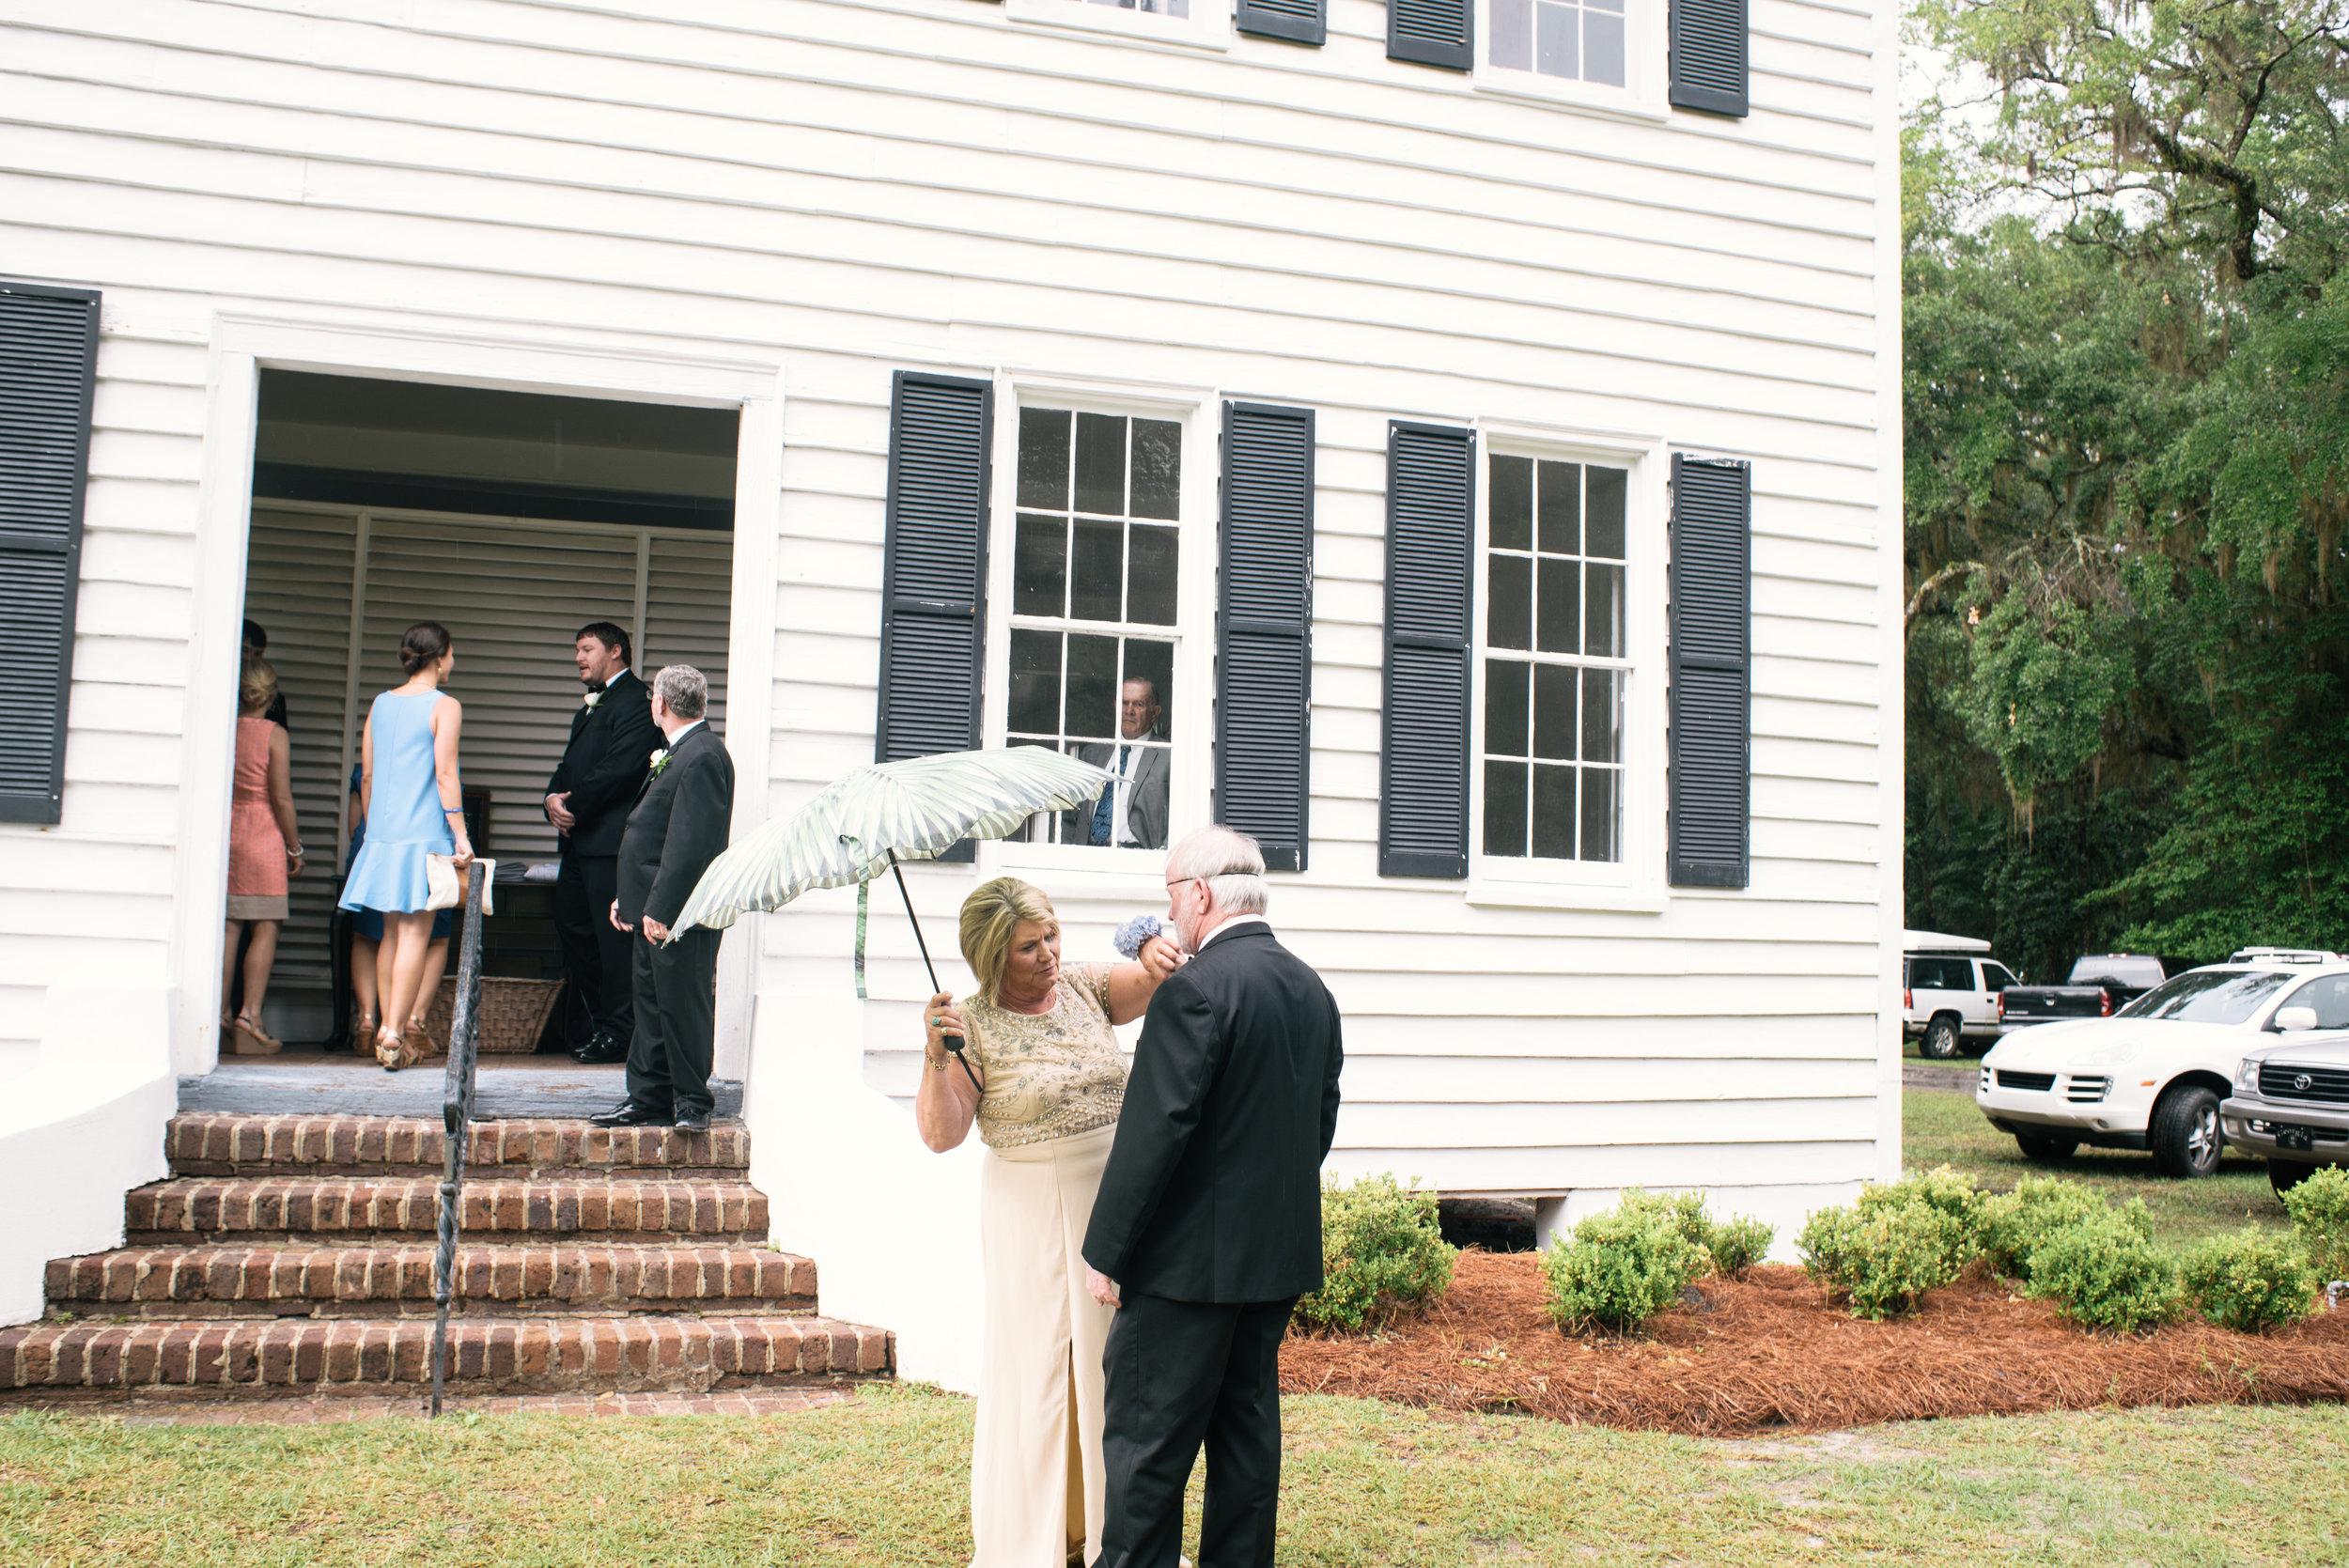 ali-and-jared-savannah-georgia-may-2017-wedding-meg-hill-photo-(149of760).jpg